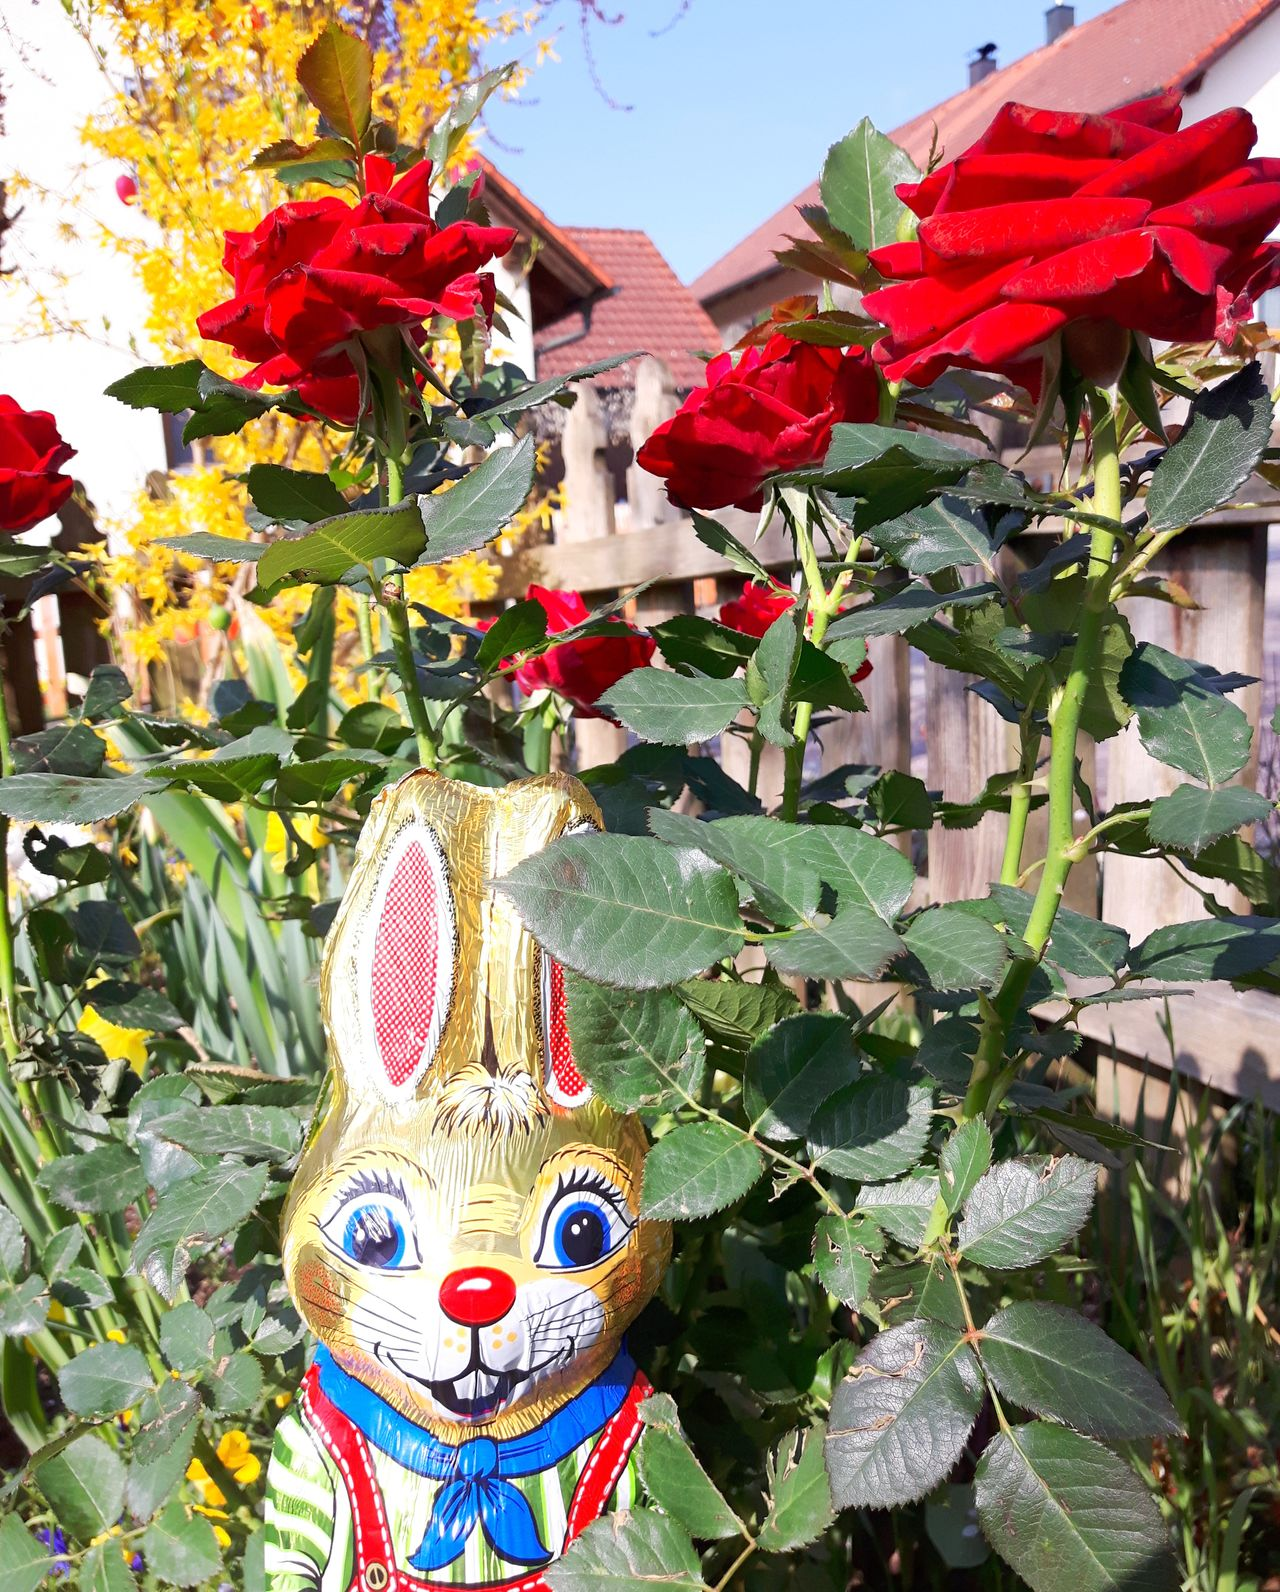 Ich wünsche euch einen wunderschönen Nachmittag. Day Close-up Multi Colored Flowers, Nature And Beauty Beliebte Fotos Eyem Collection Germany🇩🇪 EyeEm Best Shots Ostern Easter Ostern 2017 Easter Bunny Rose Collection Roses Flowers  Roses🌹 Rose🌹 Bayern Germany